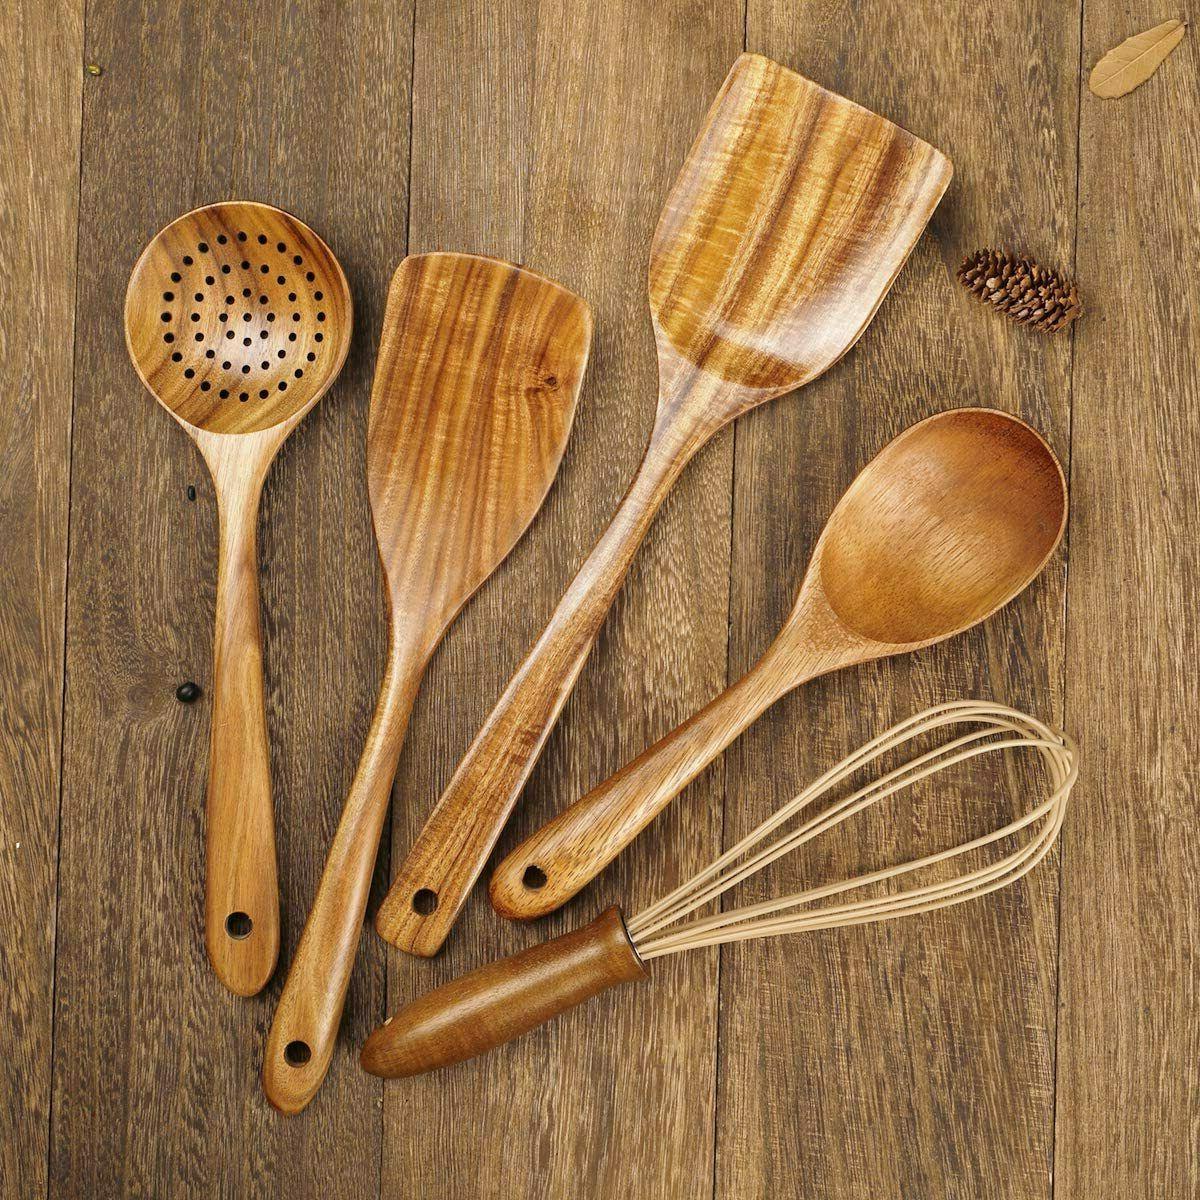 NEW Set,Wooden Cooking Nonstick